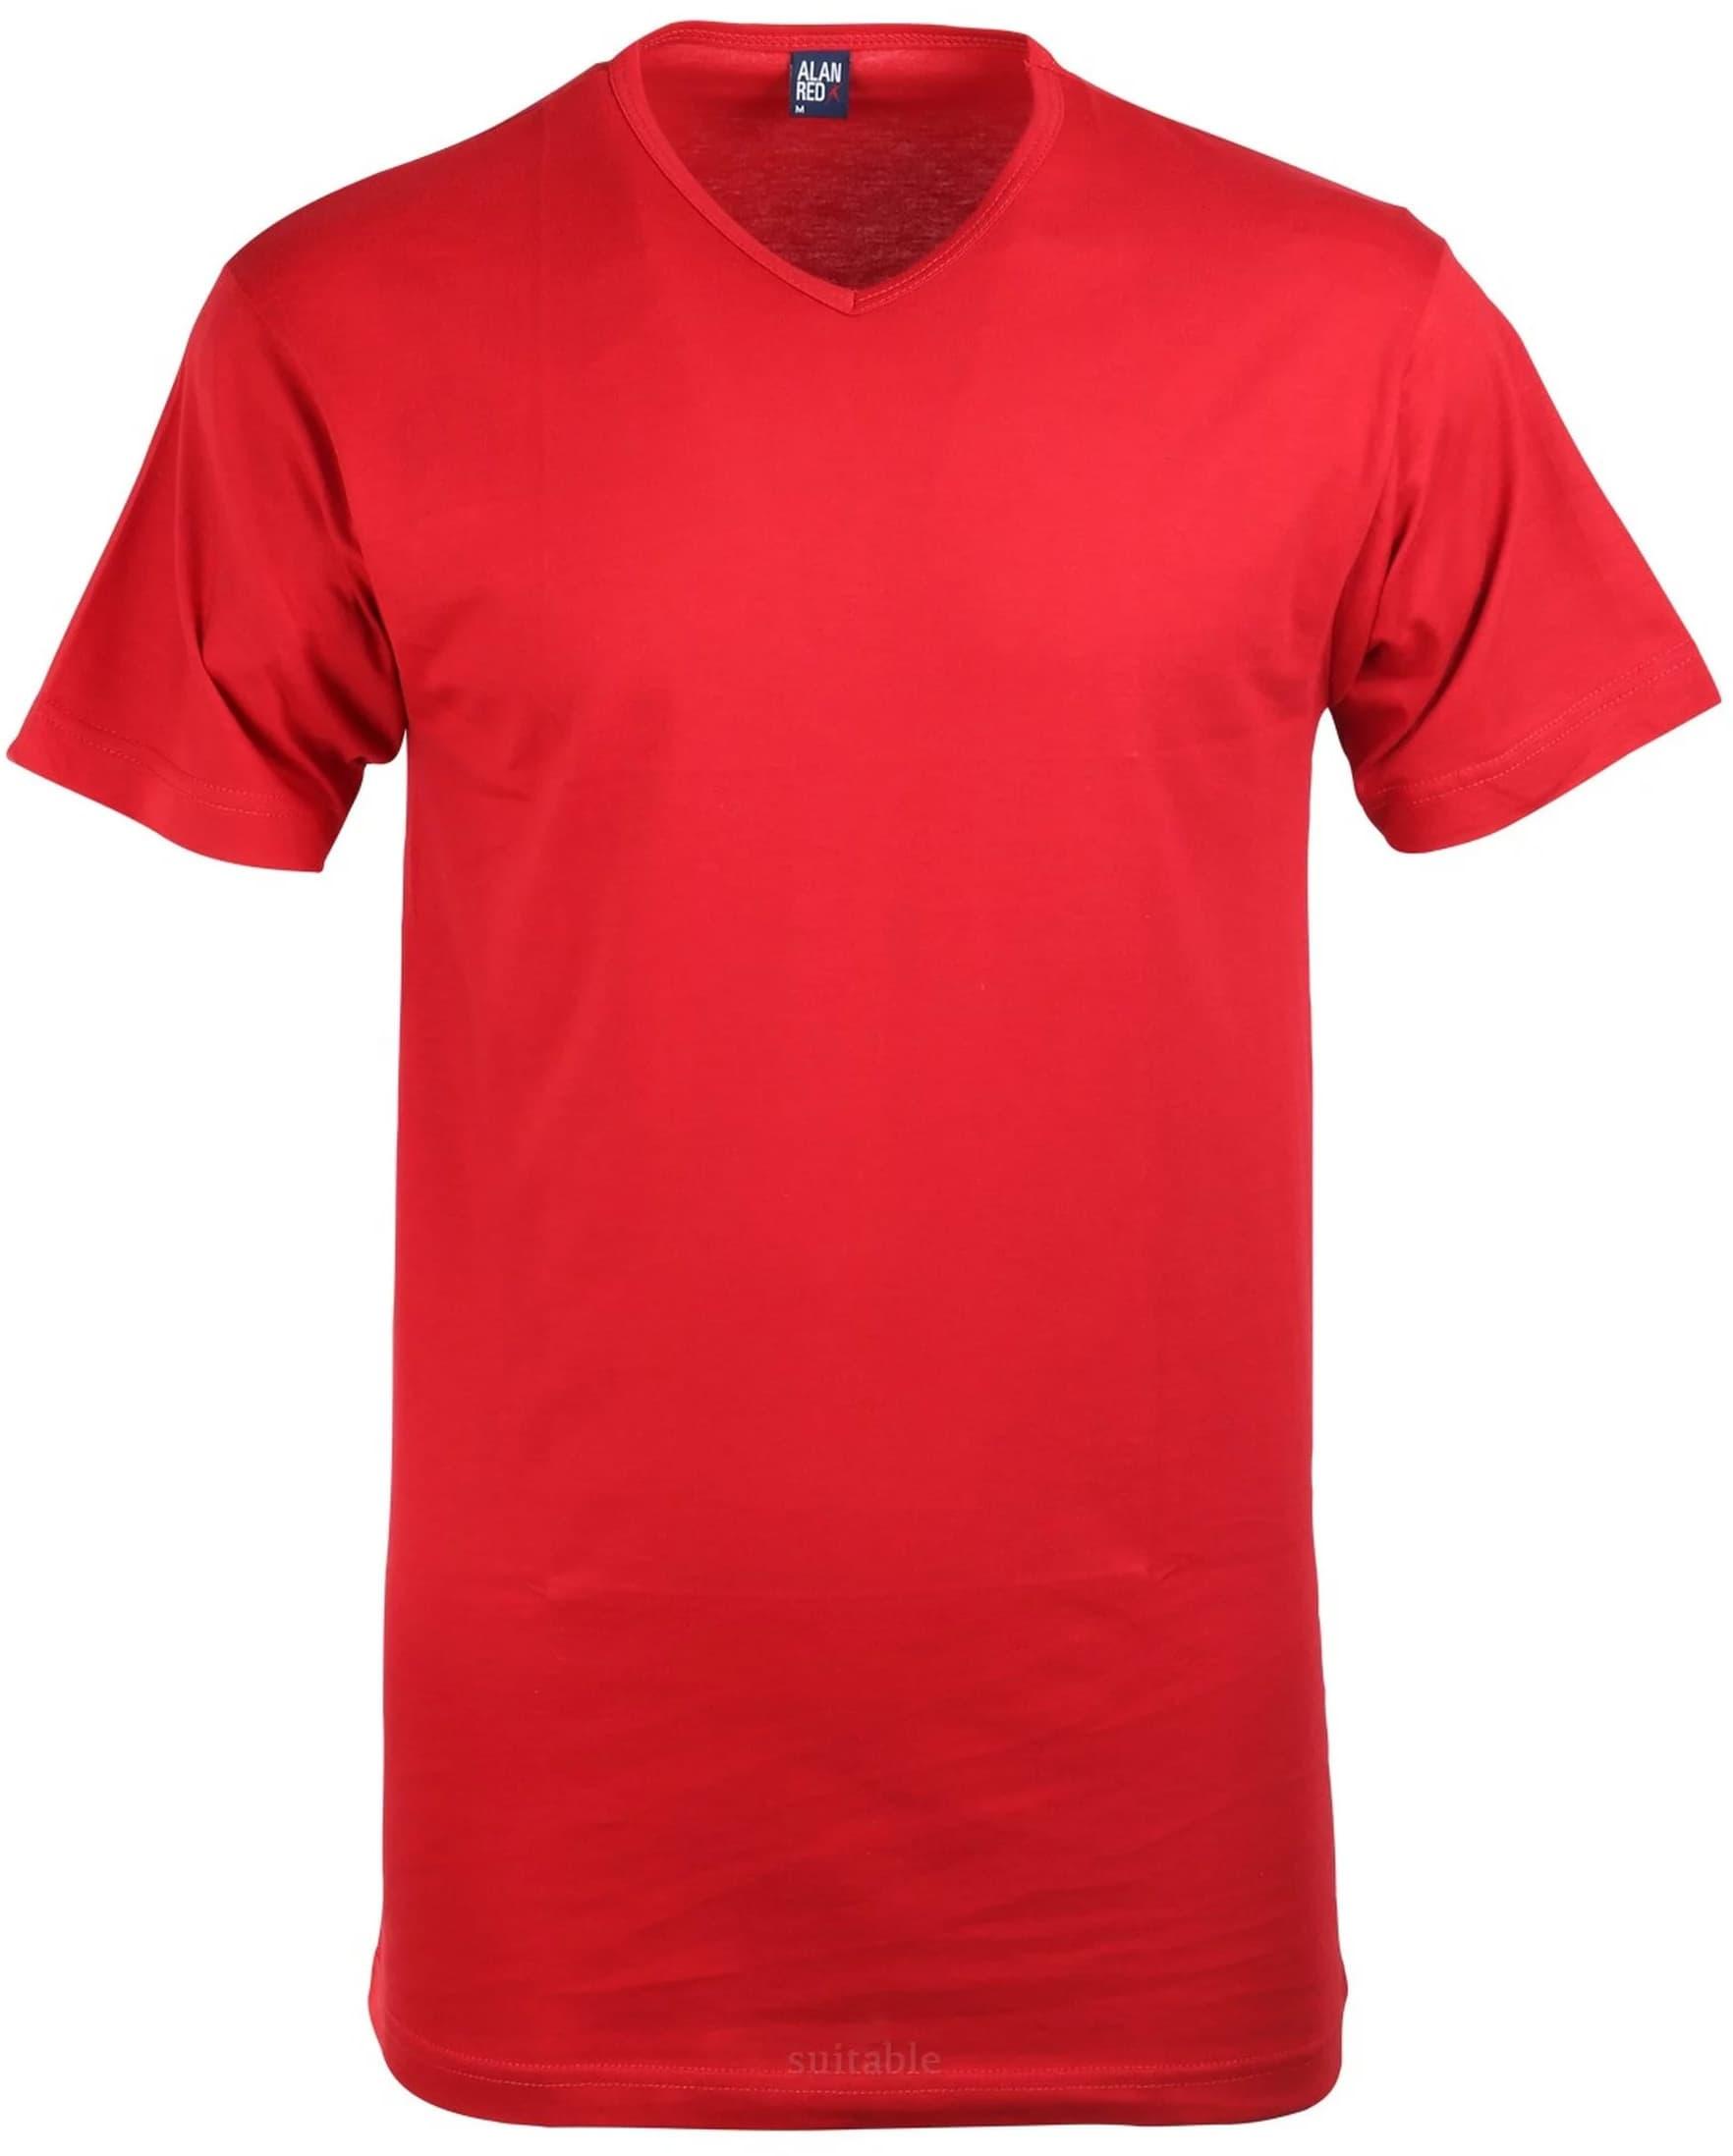 Alan Red T-Shirt V-Ausschnitt Vermont Stone Red (1er-Pack)